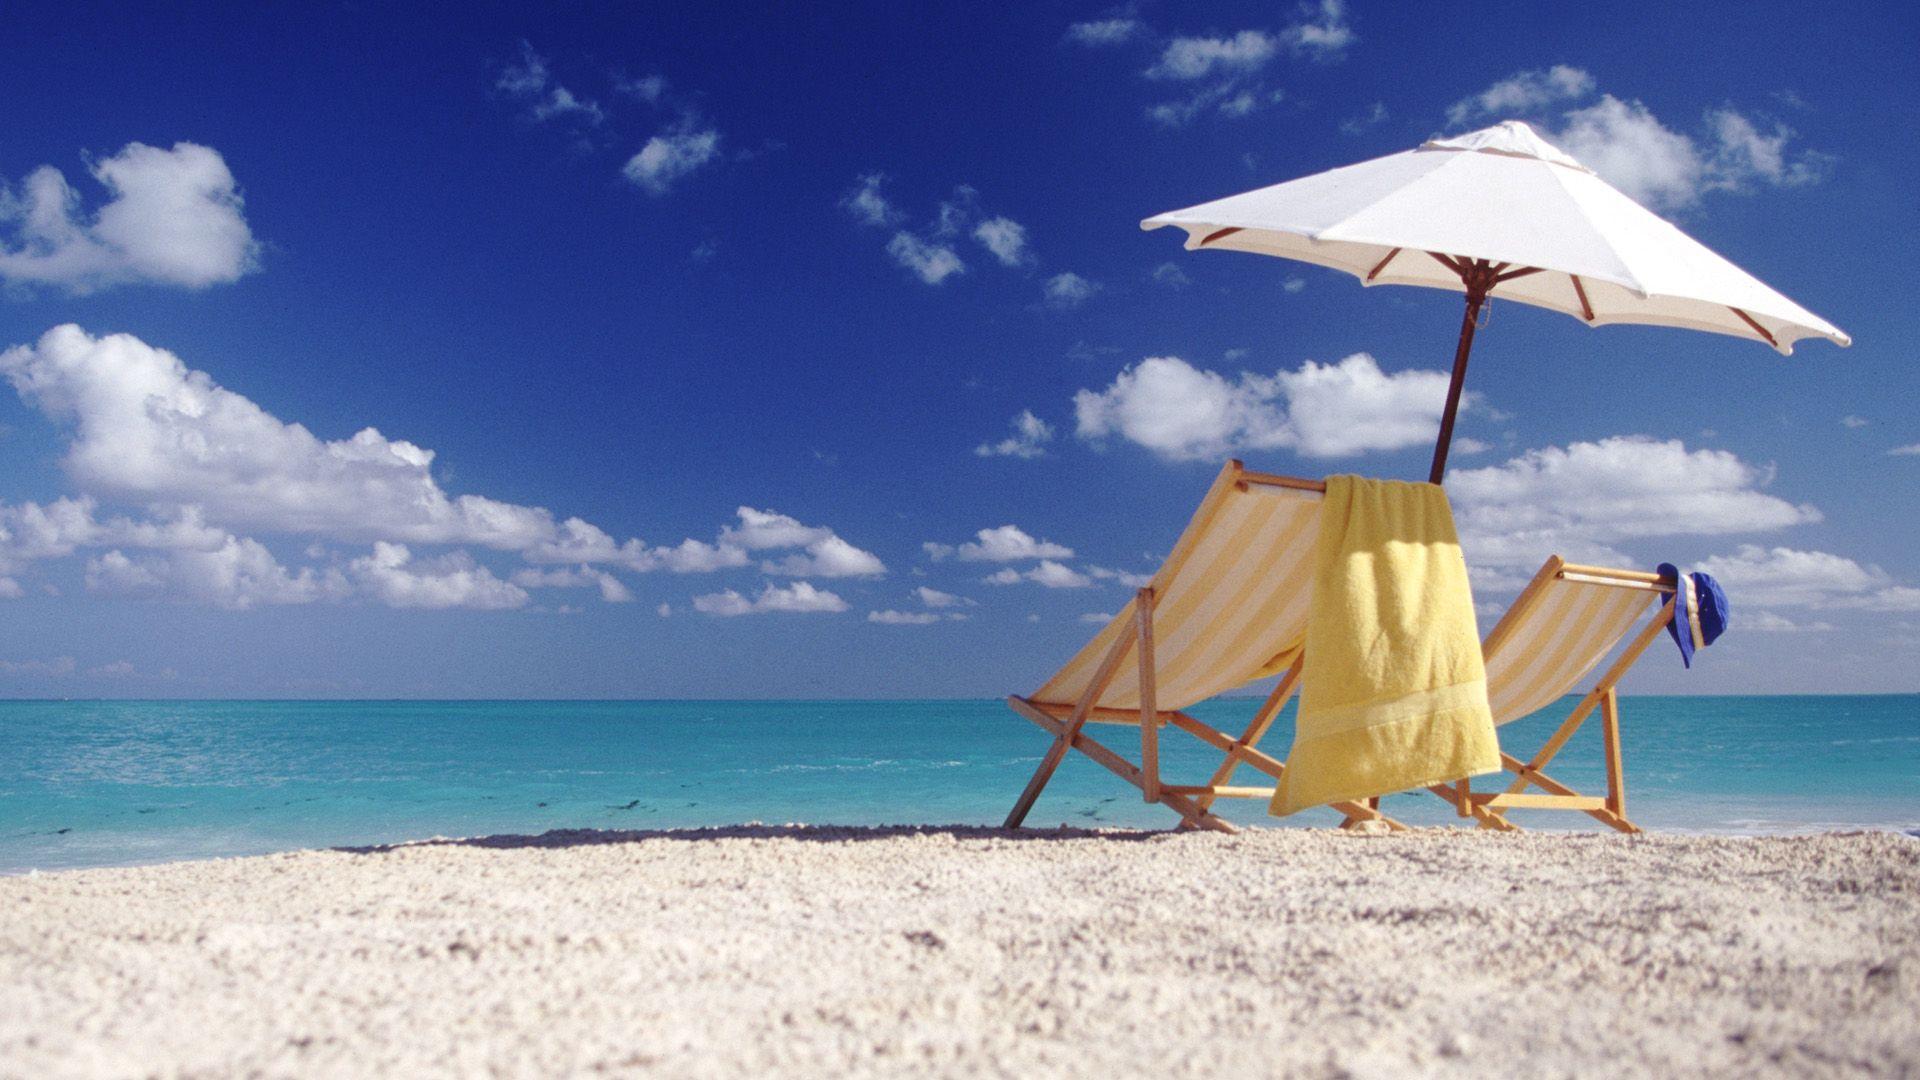 A Day At The Beach Chillin Like A Villain Garden City Beach Surfside Beach Beach Vacation Rentals